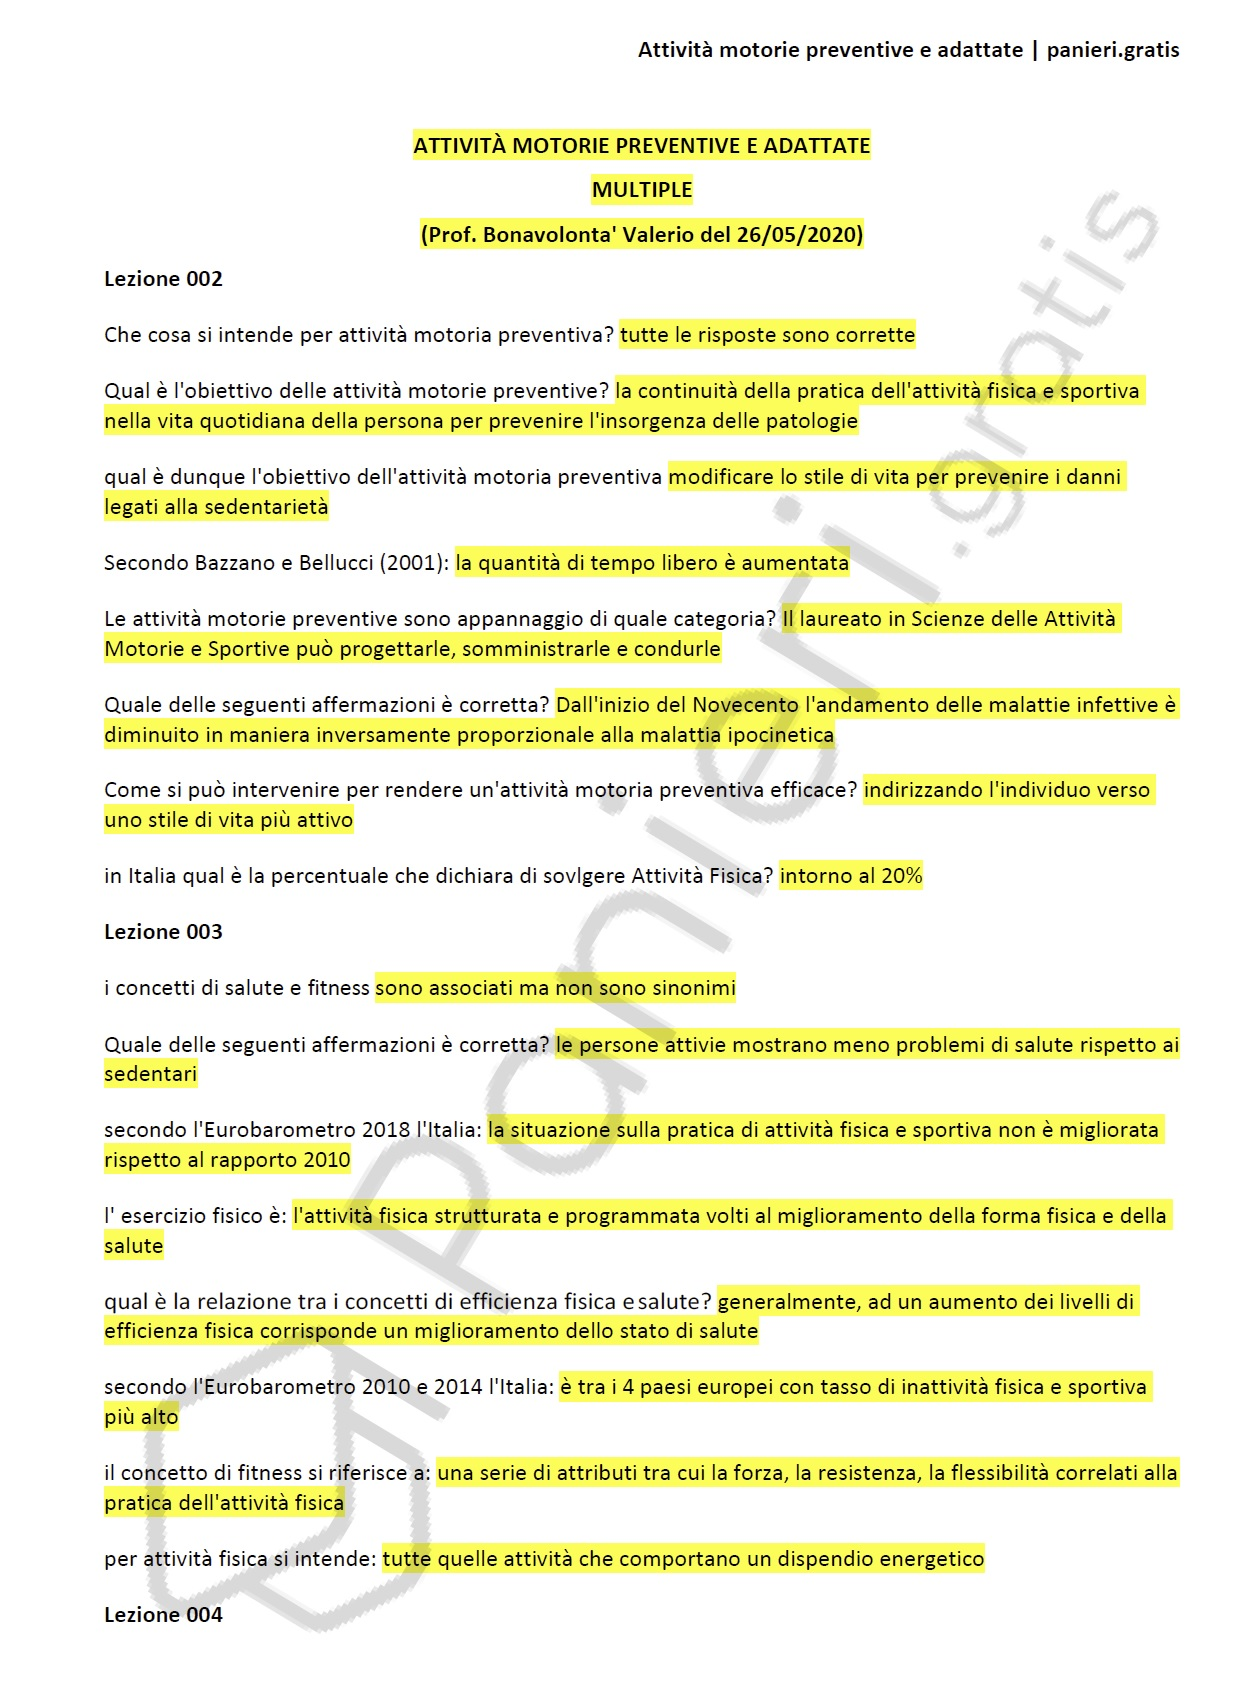 Paniere Di Attivita Motorie Preventive E Adattate Multiple Ecampus Panieri Gratis